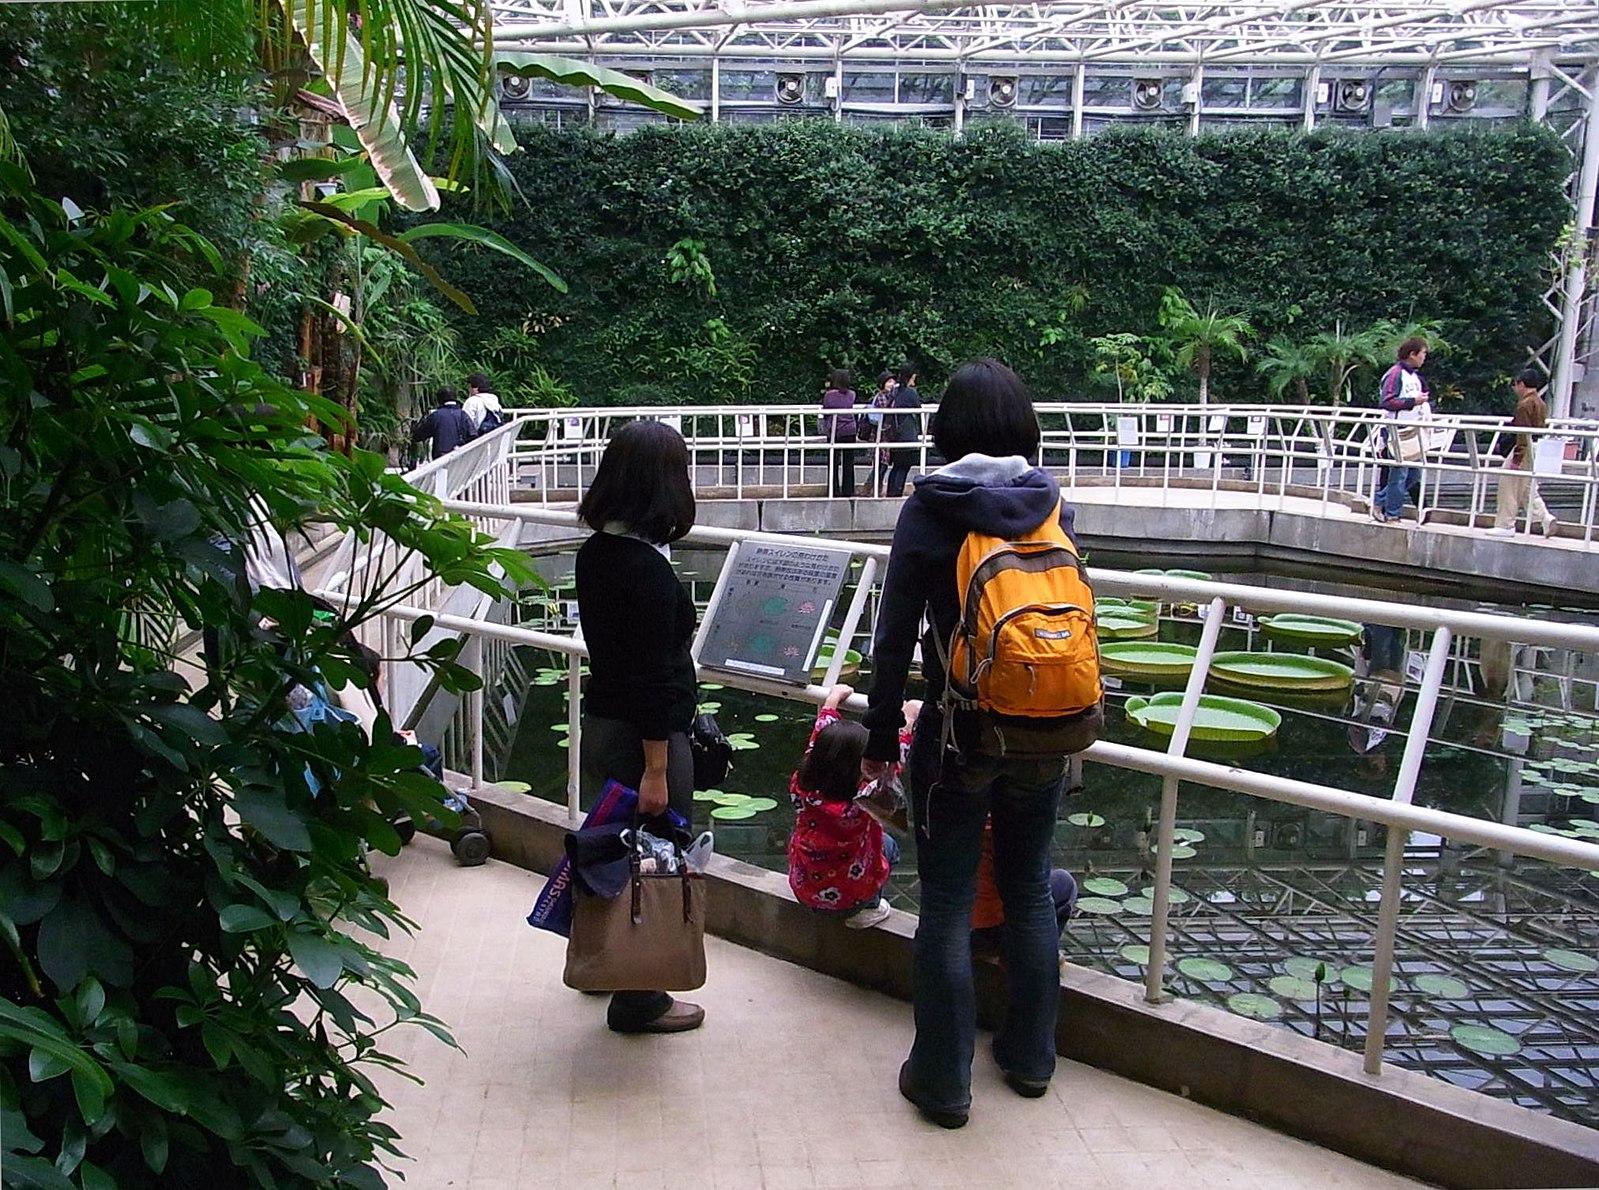 Jindai Botanical Garden Mitaka Travel Guide: A Quick Trip From Tokyo